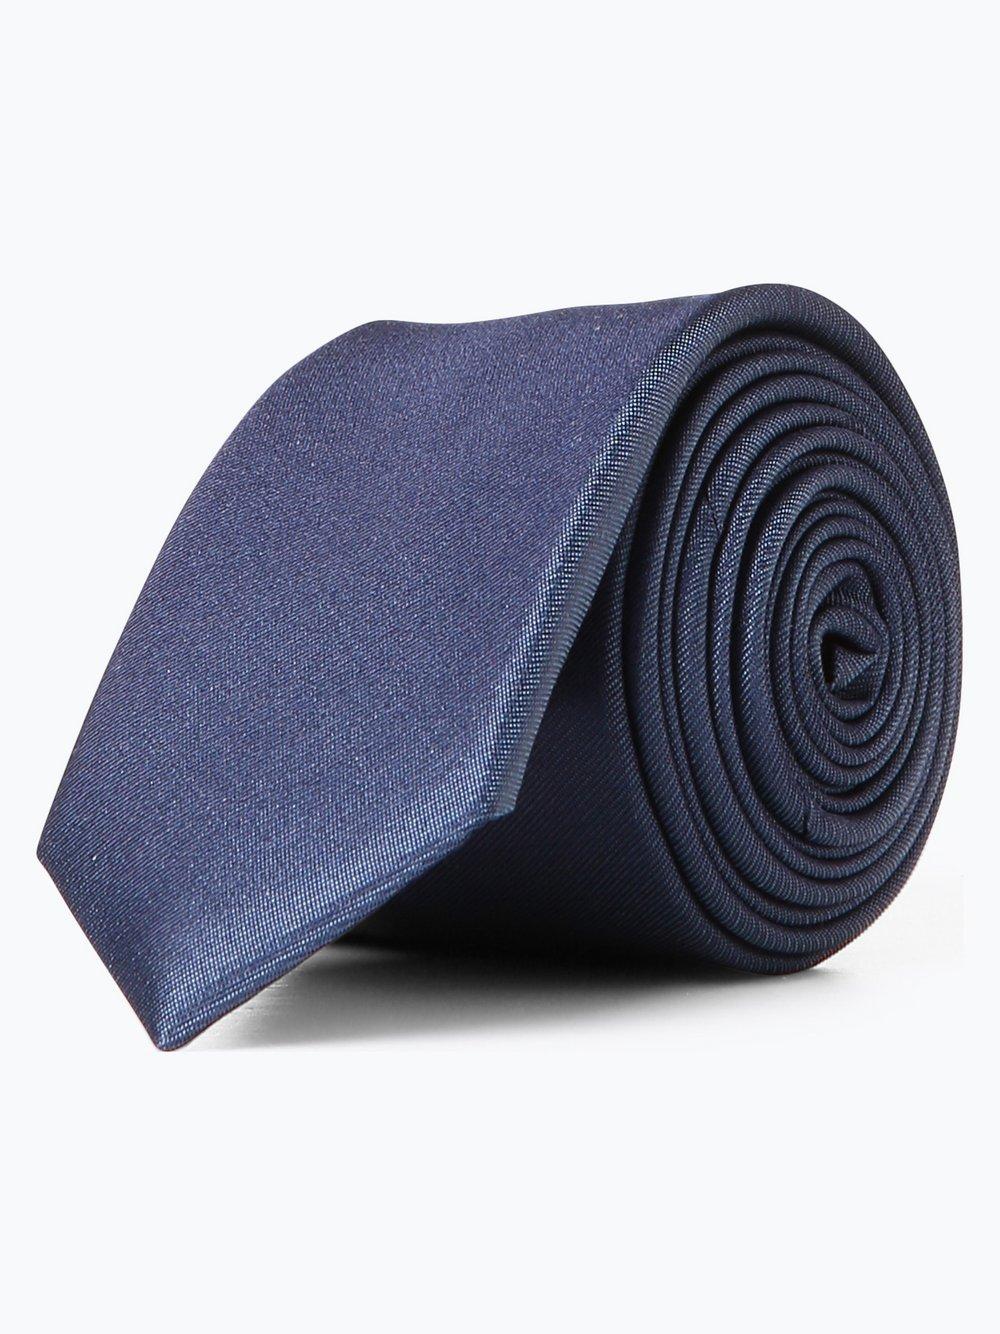 Olymp Level Five – Krawat jedwabny męski, niebieski Van Graaf 388062-0004-00000